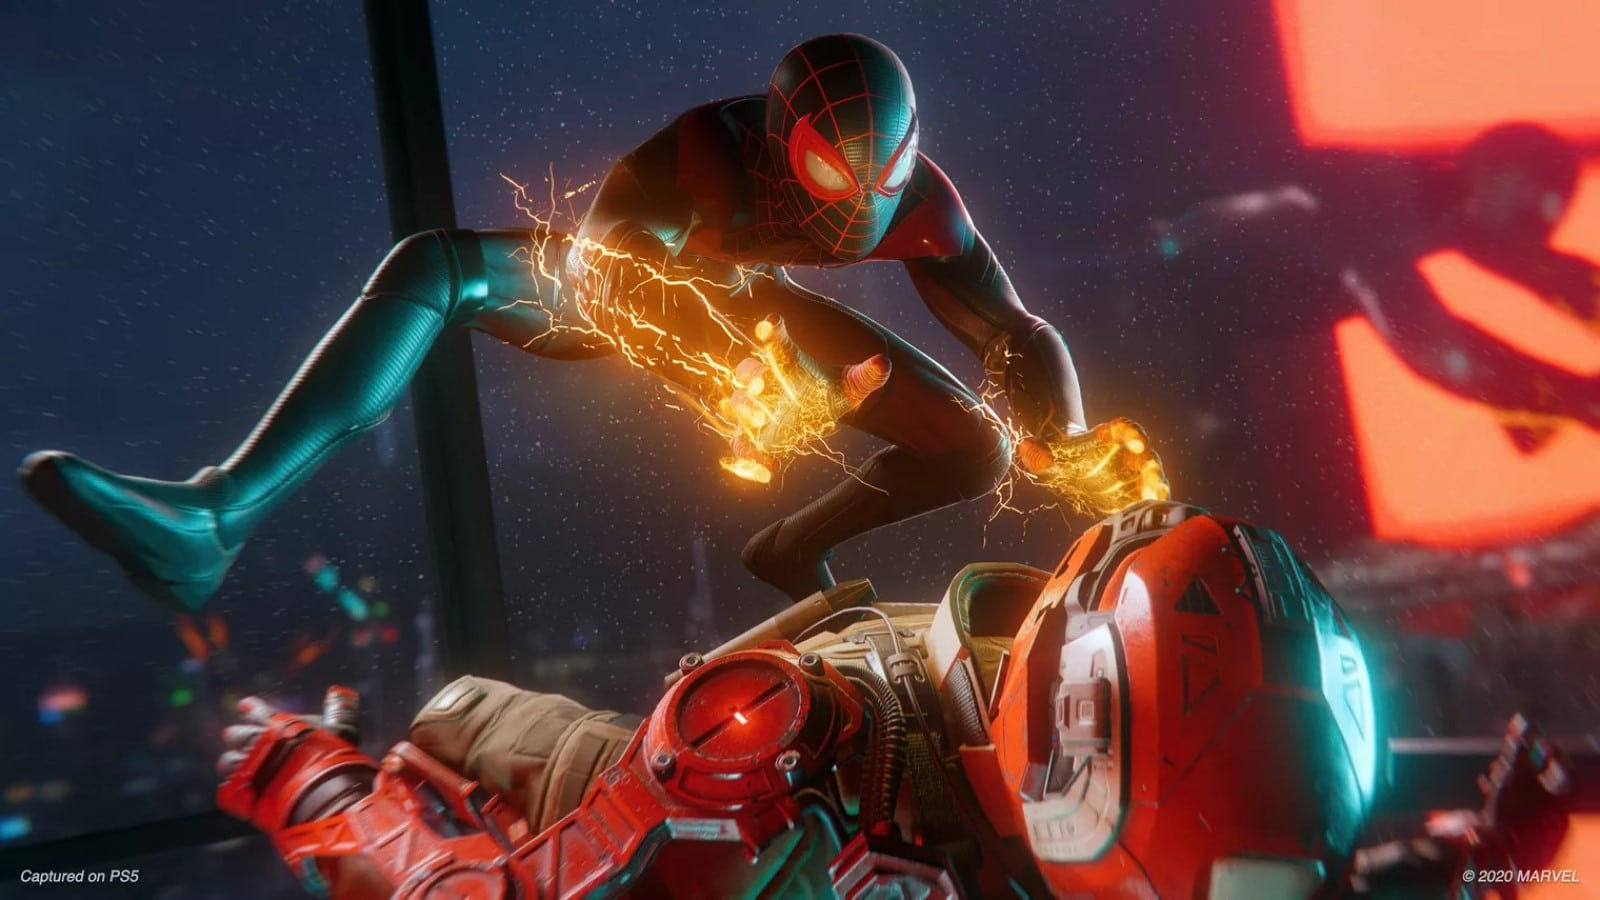 miles morales in spiderman